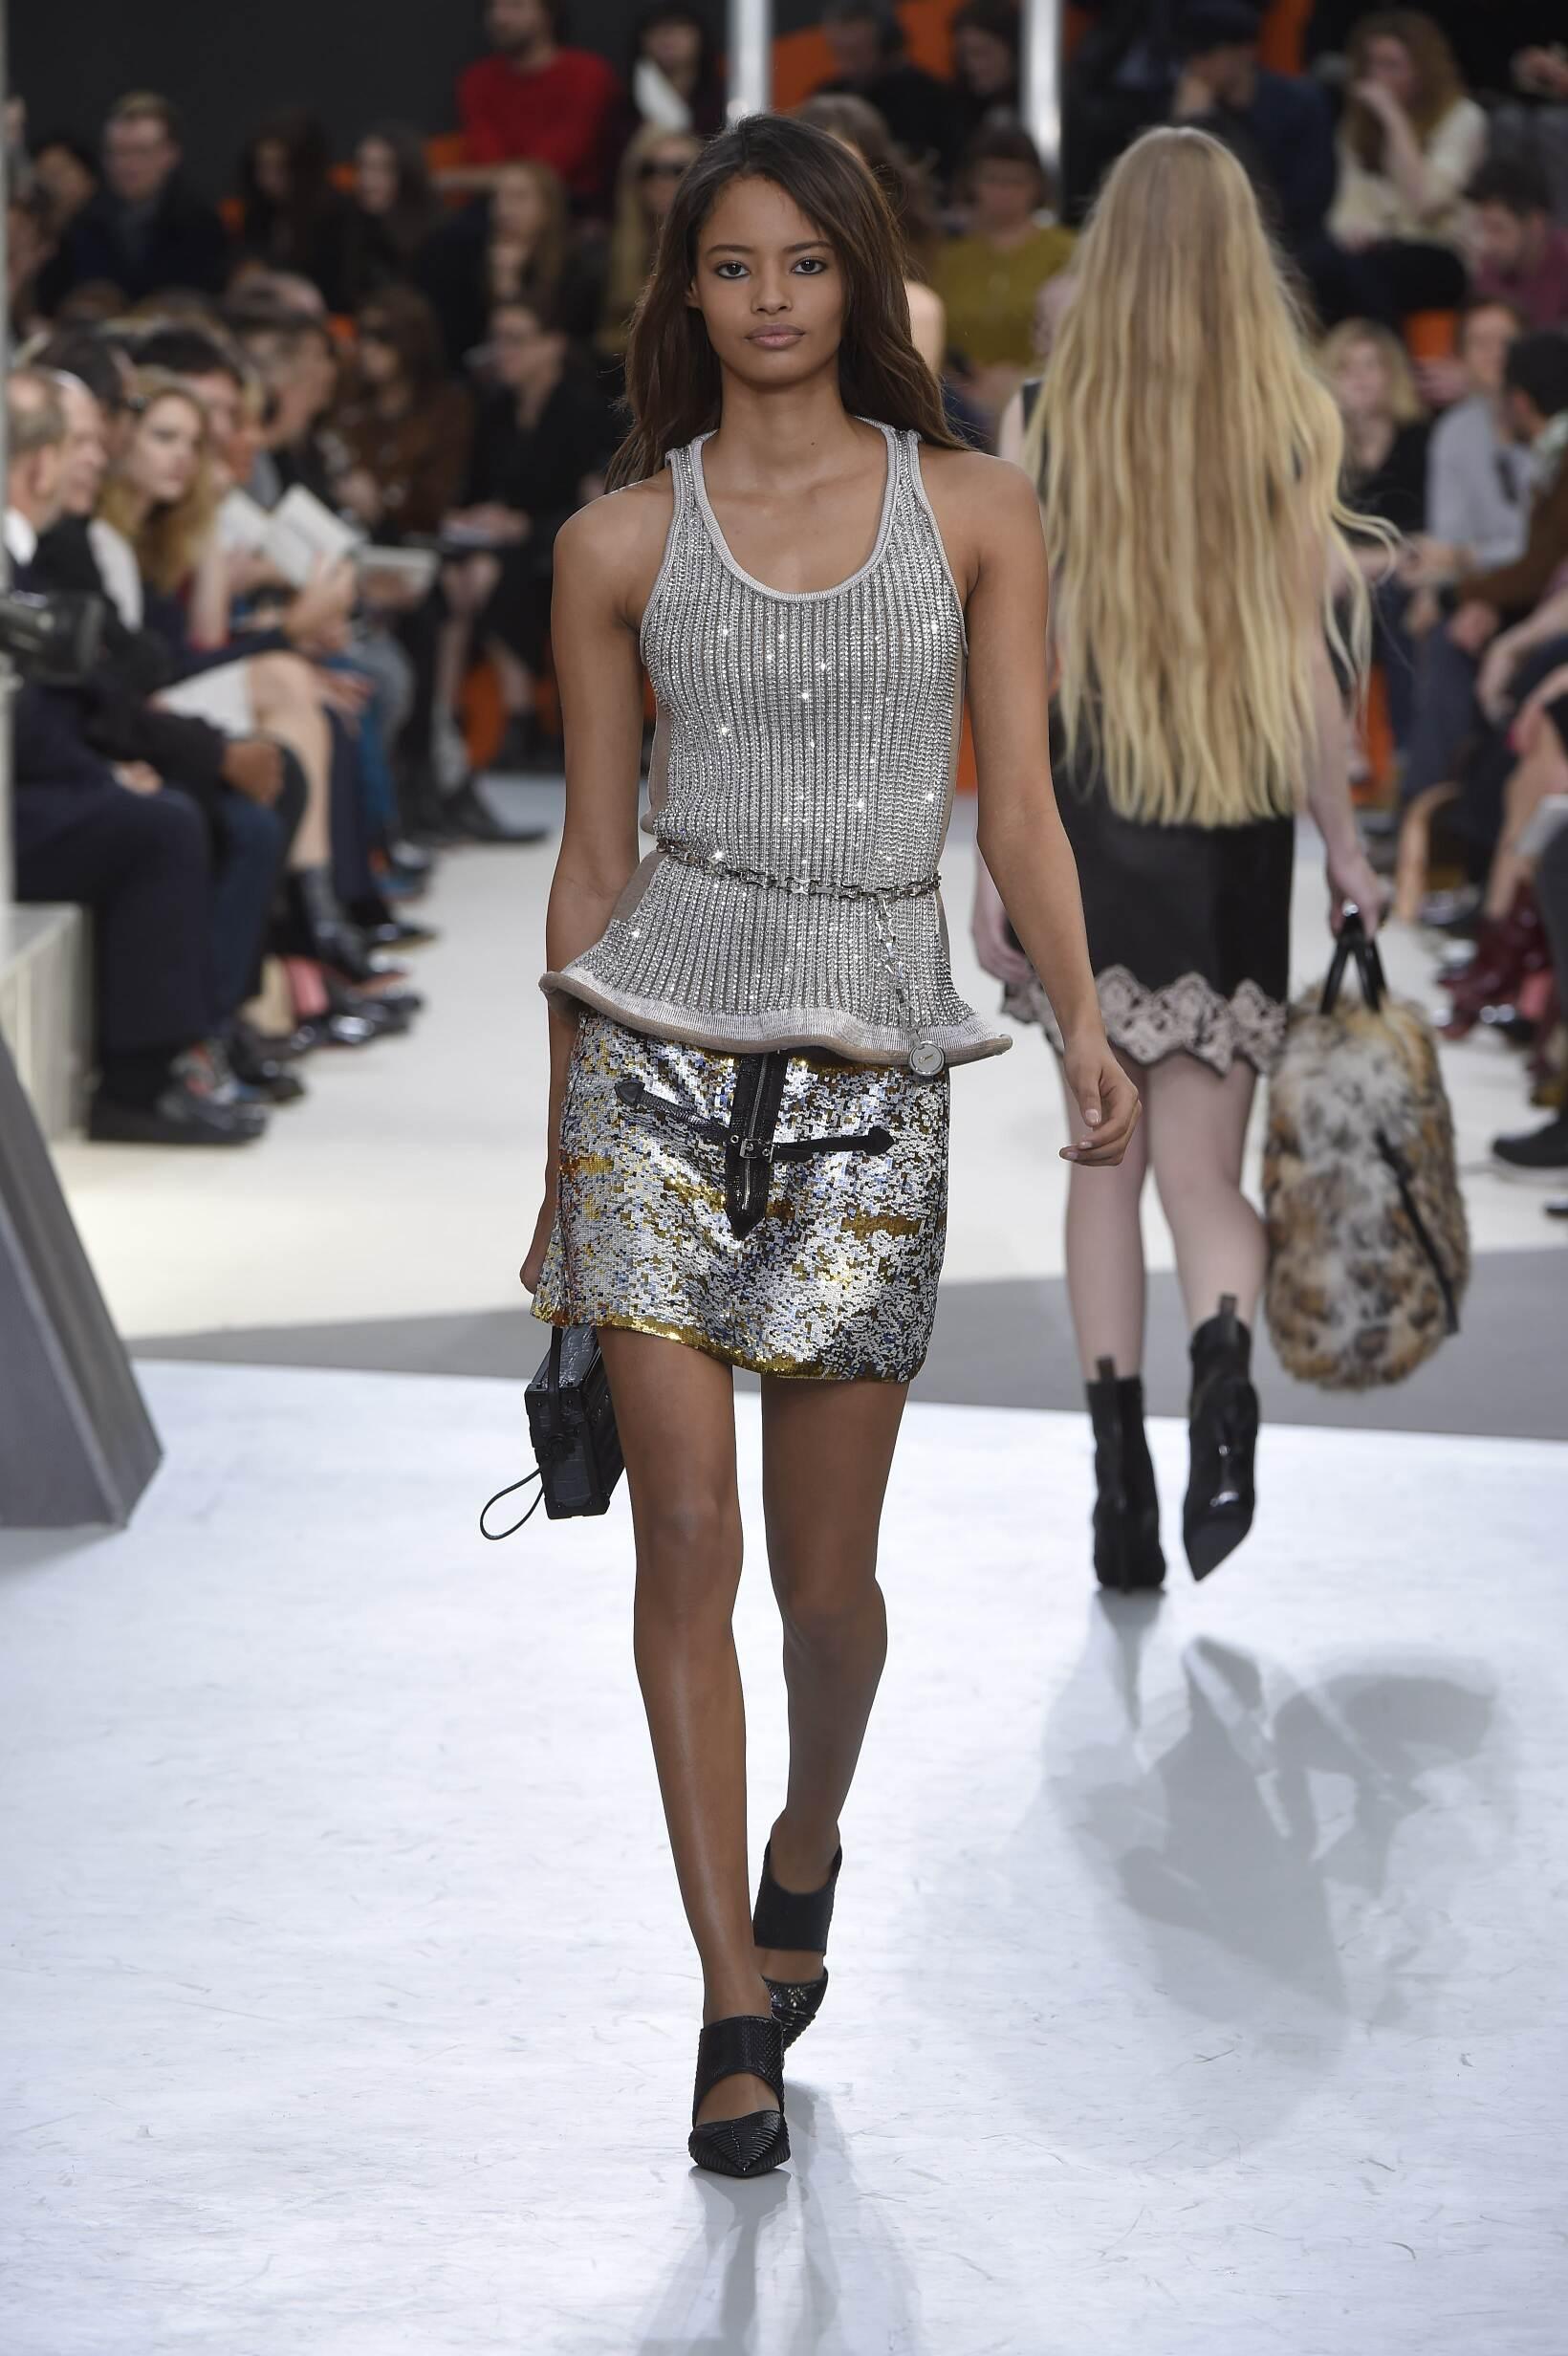 Louis Vuitton Collection Fashion Show FW 2015 2016